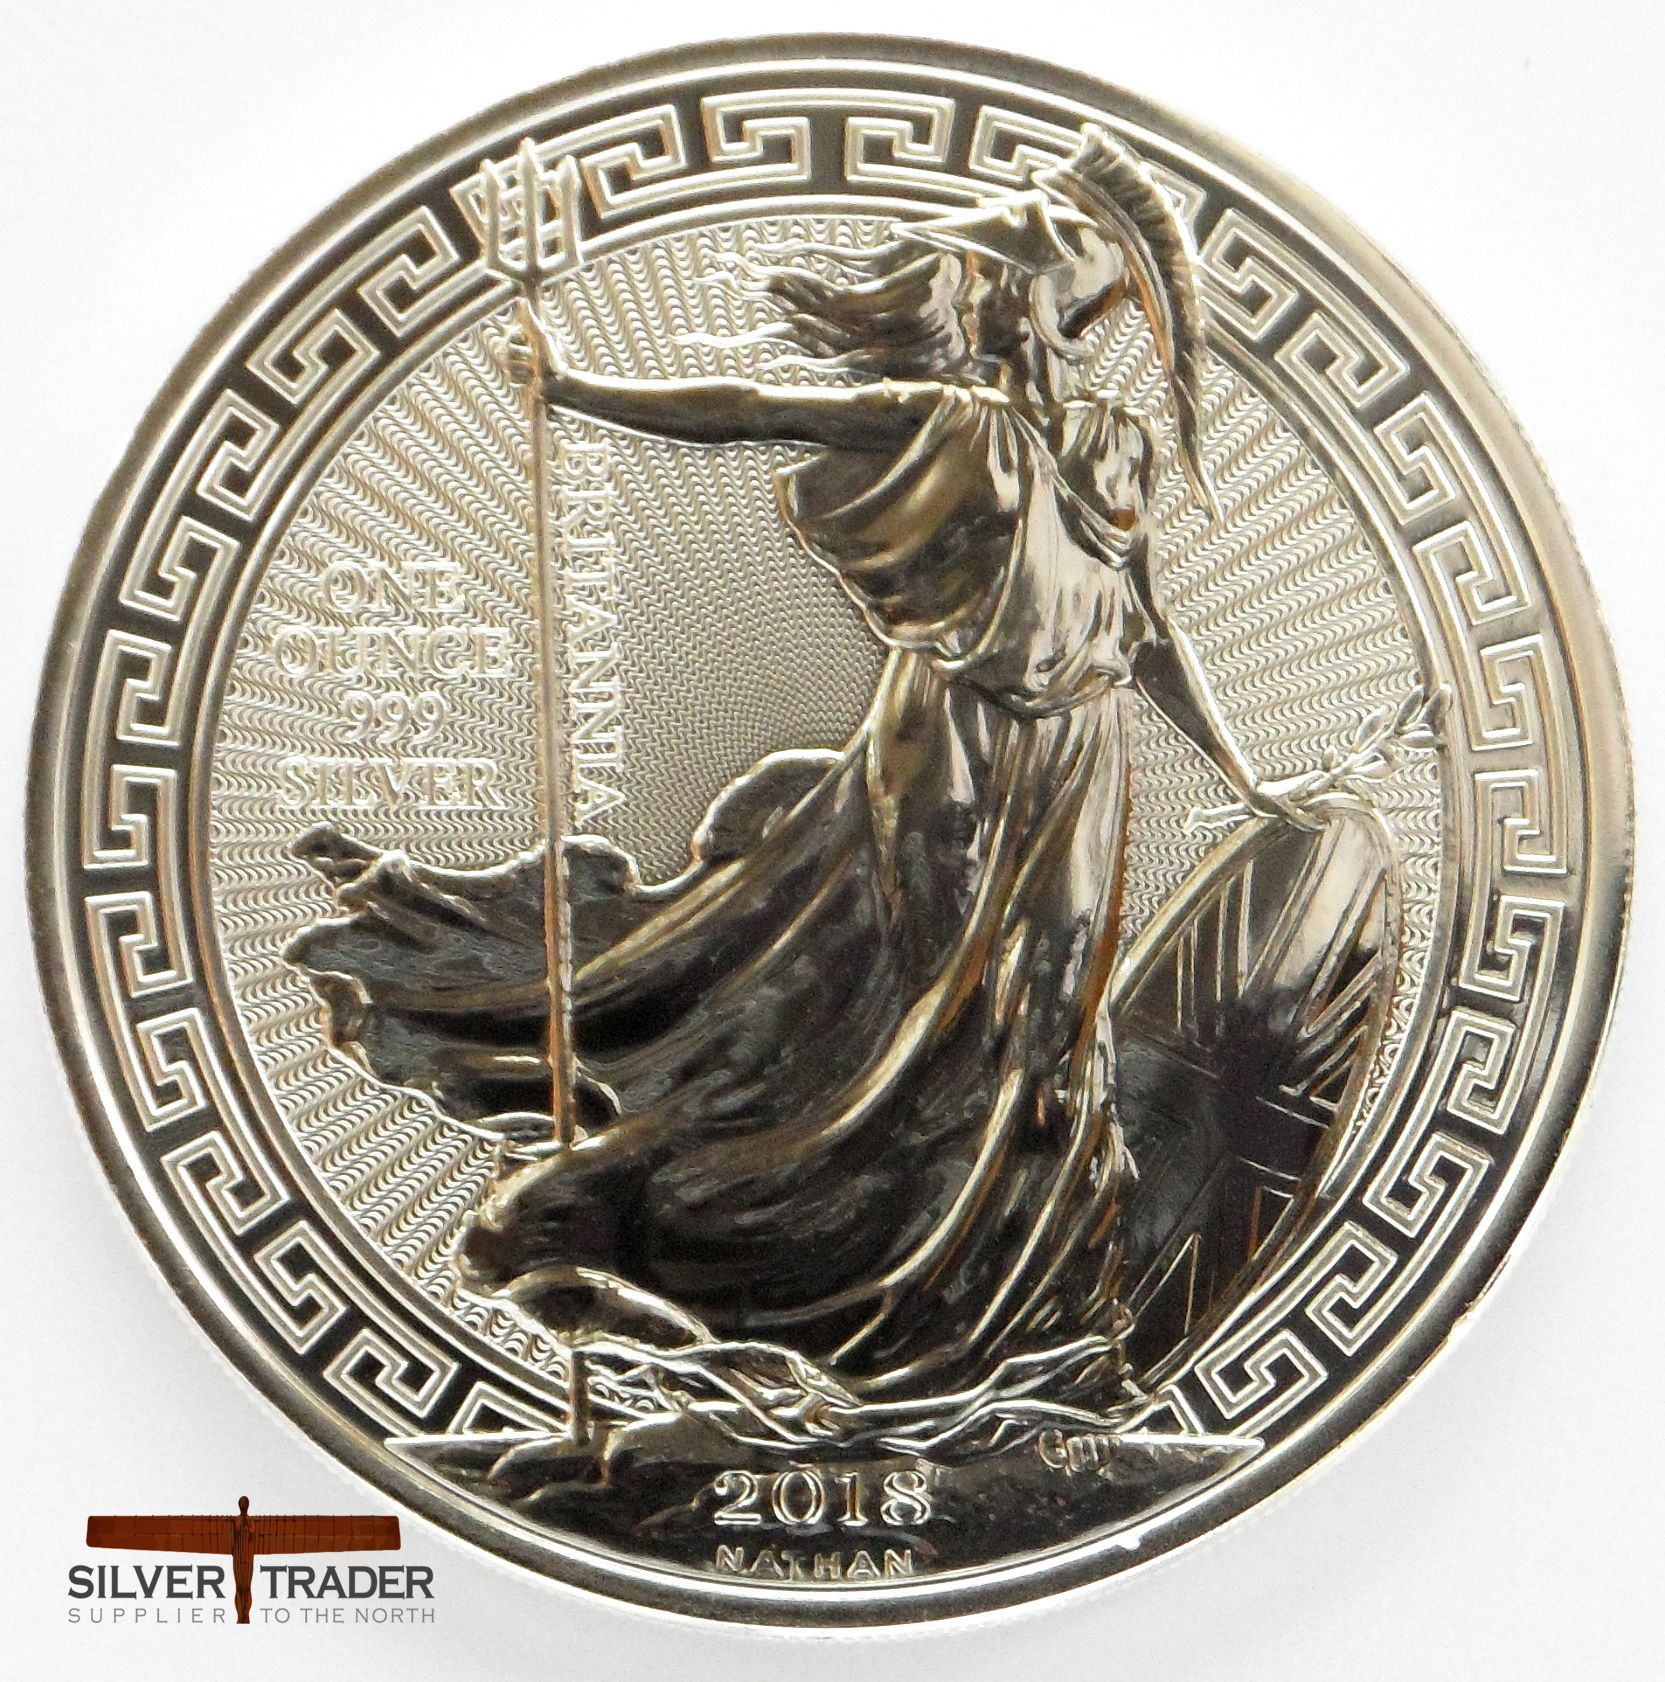 2018 Silver Britannia Oriental Border 1 Oz Silver Bullion Coin Silver Bullion Coins Bullion Coins Coins